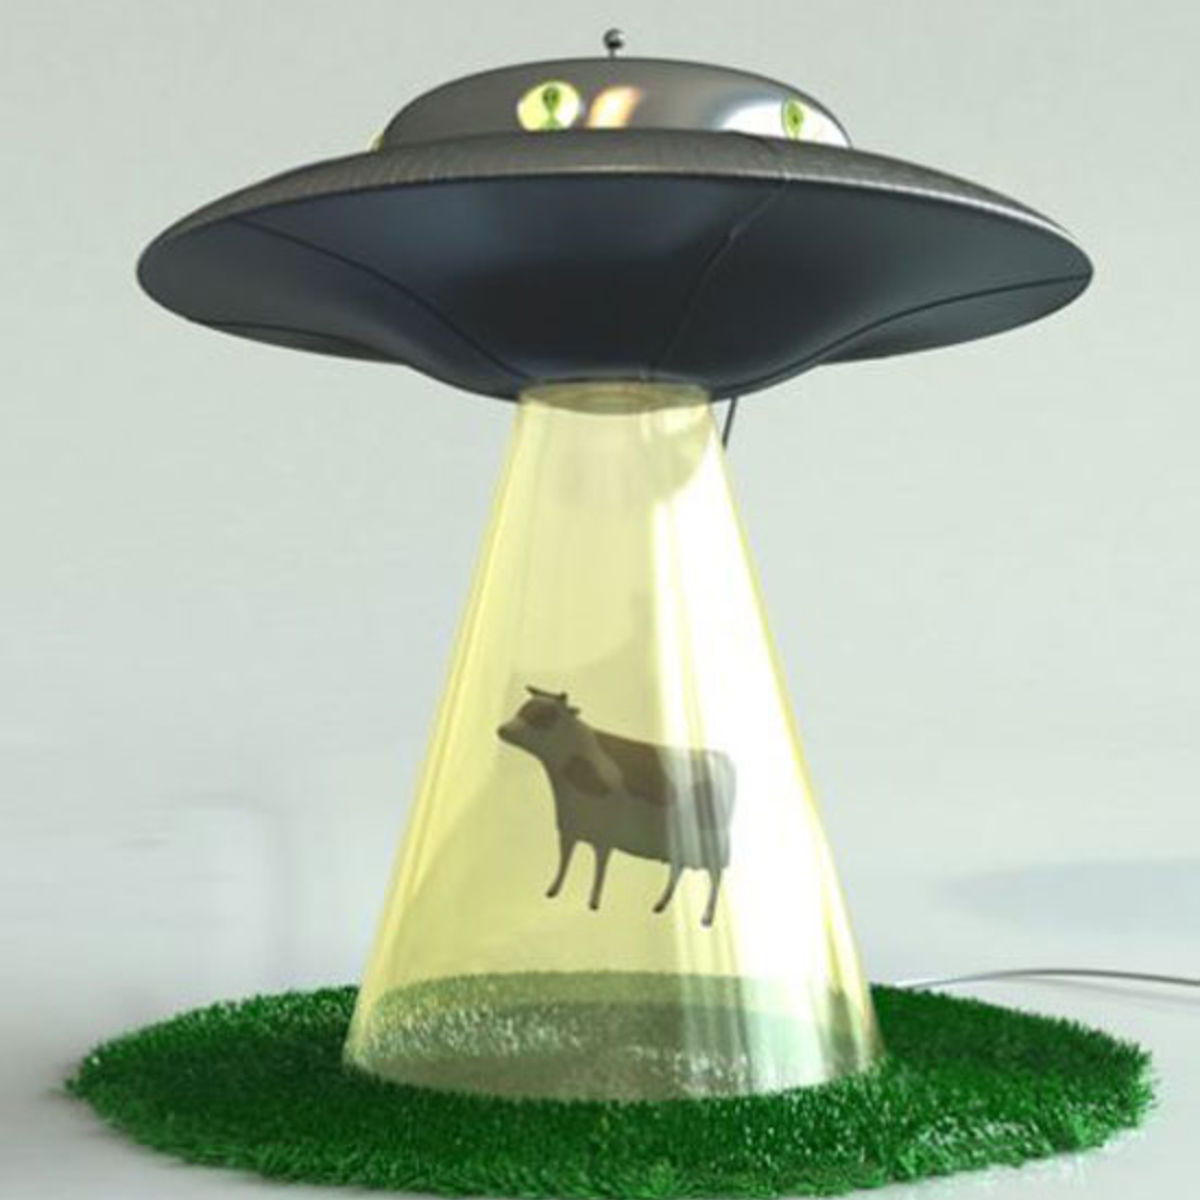 AlienAbductionLamp081211.jpg